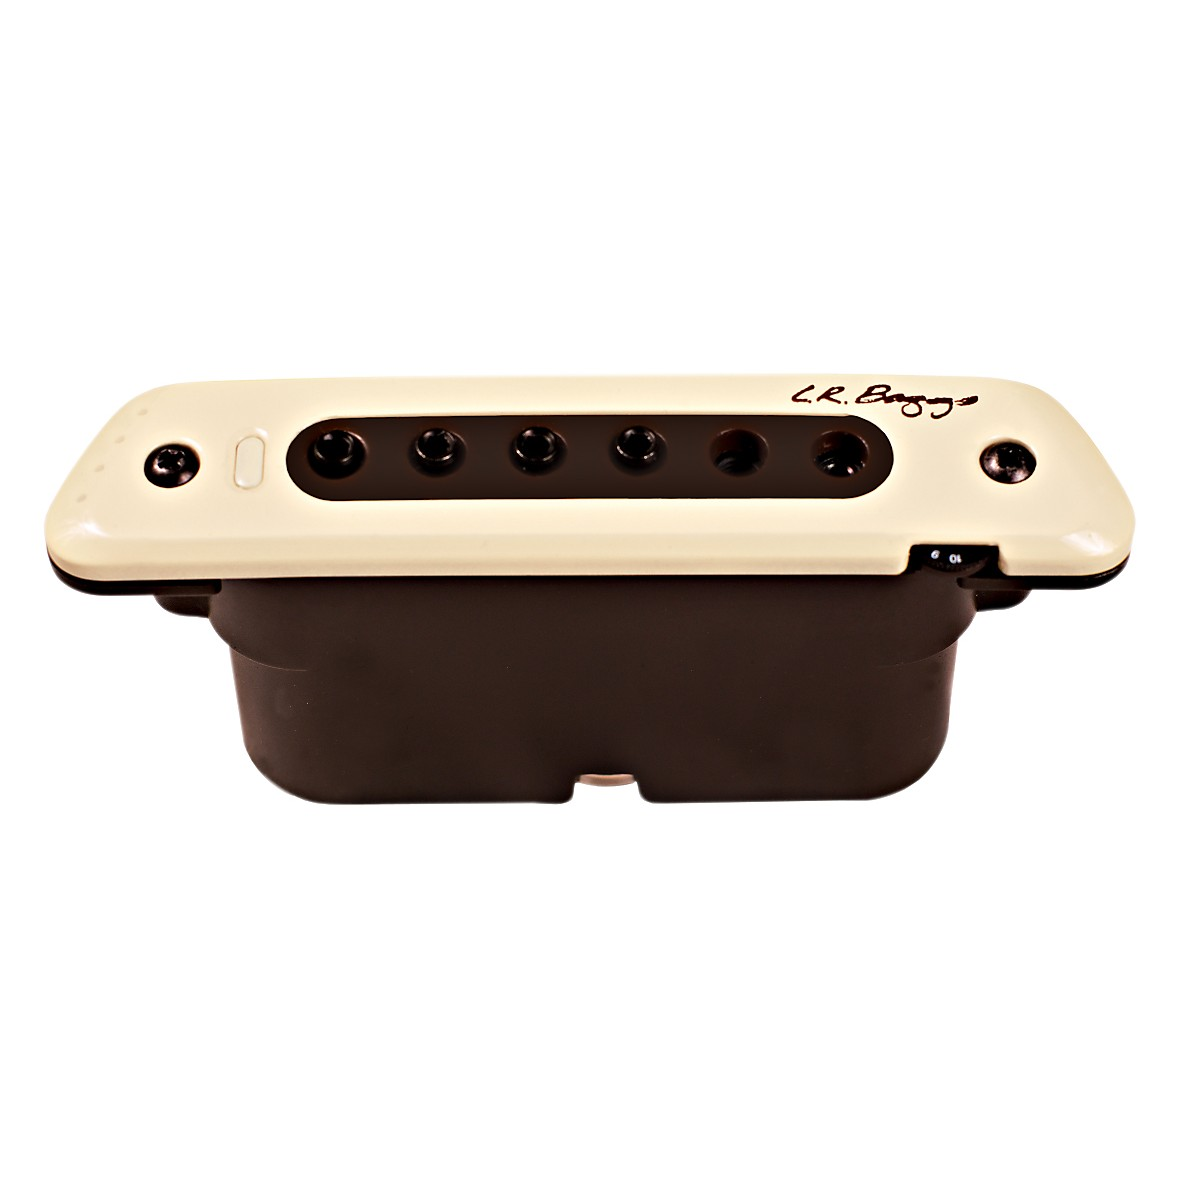 LR Baggs M80 Magnetic Soundhole Pickup